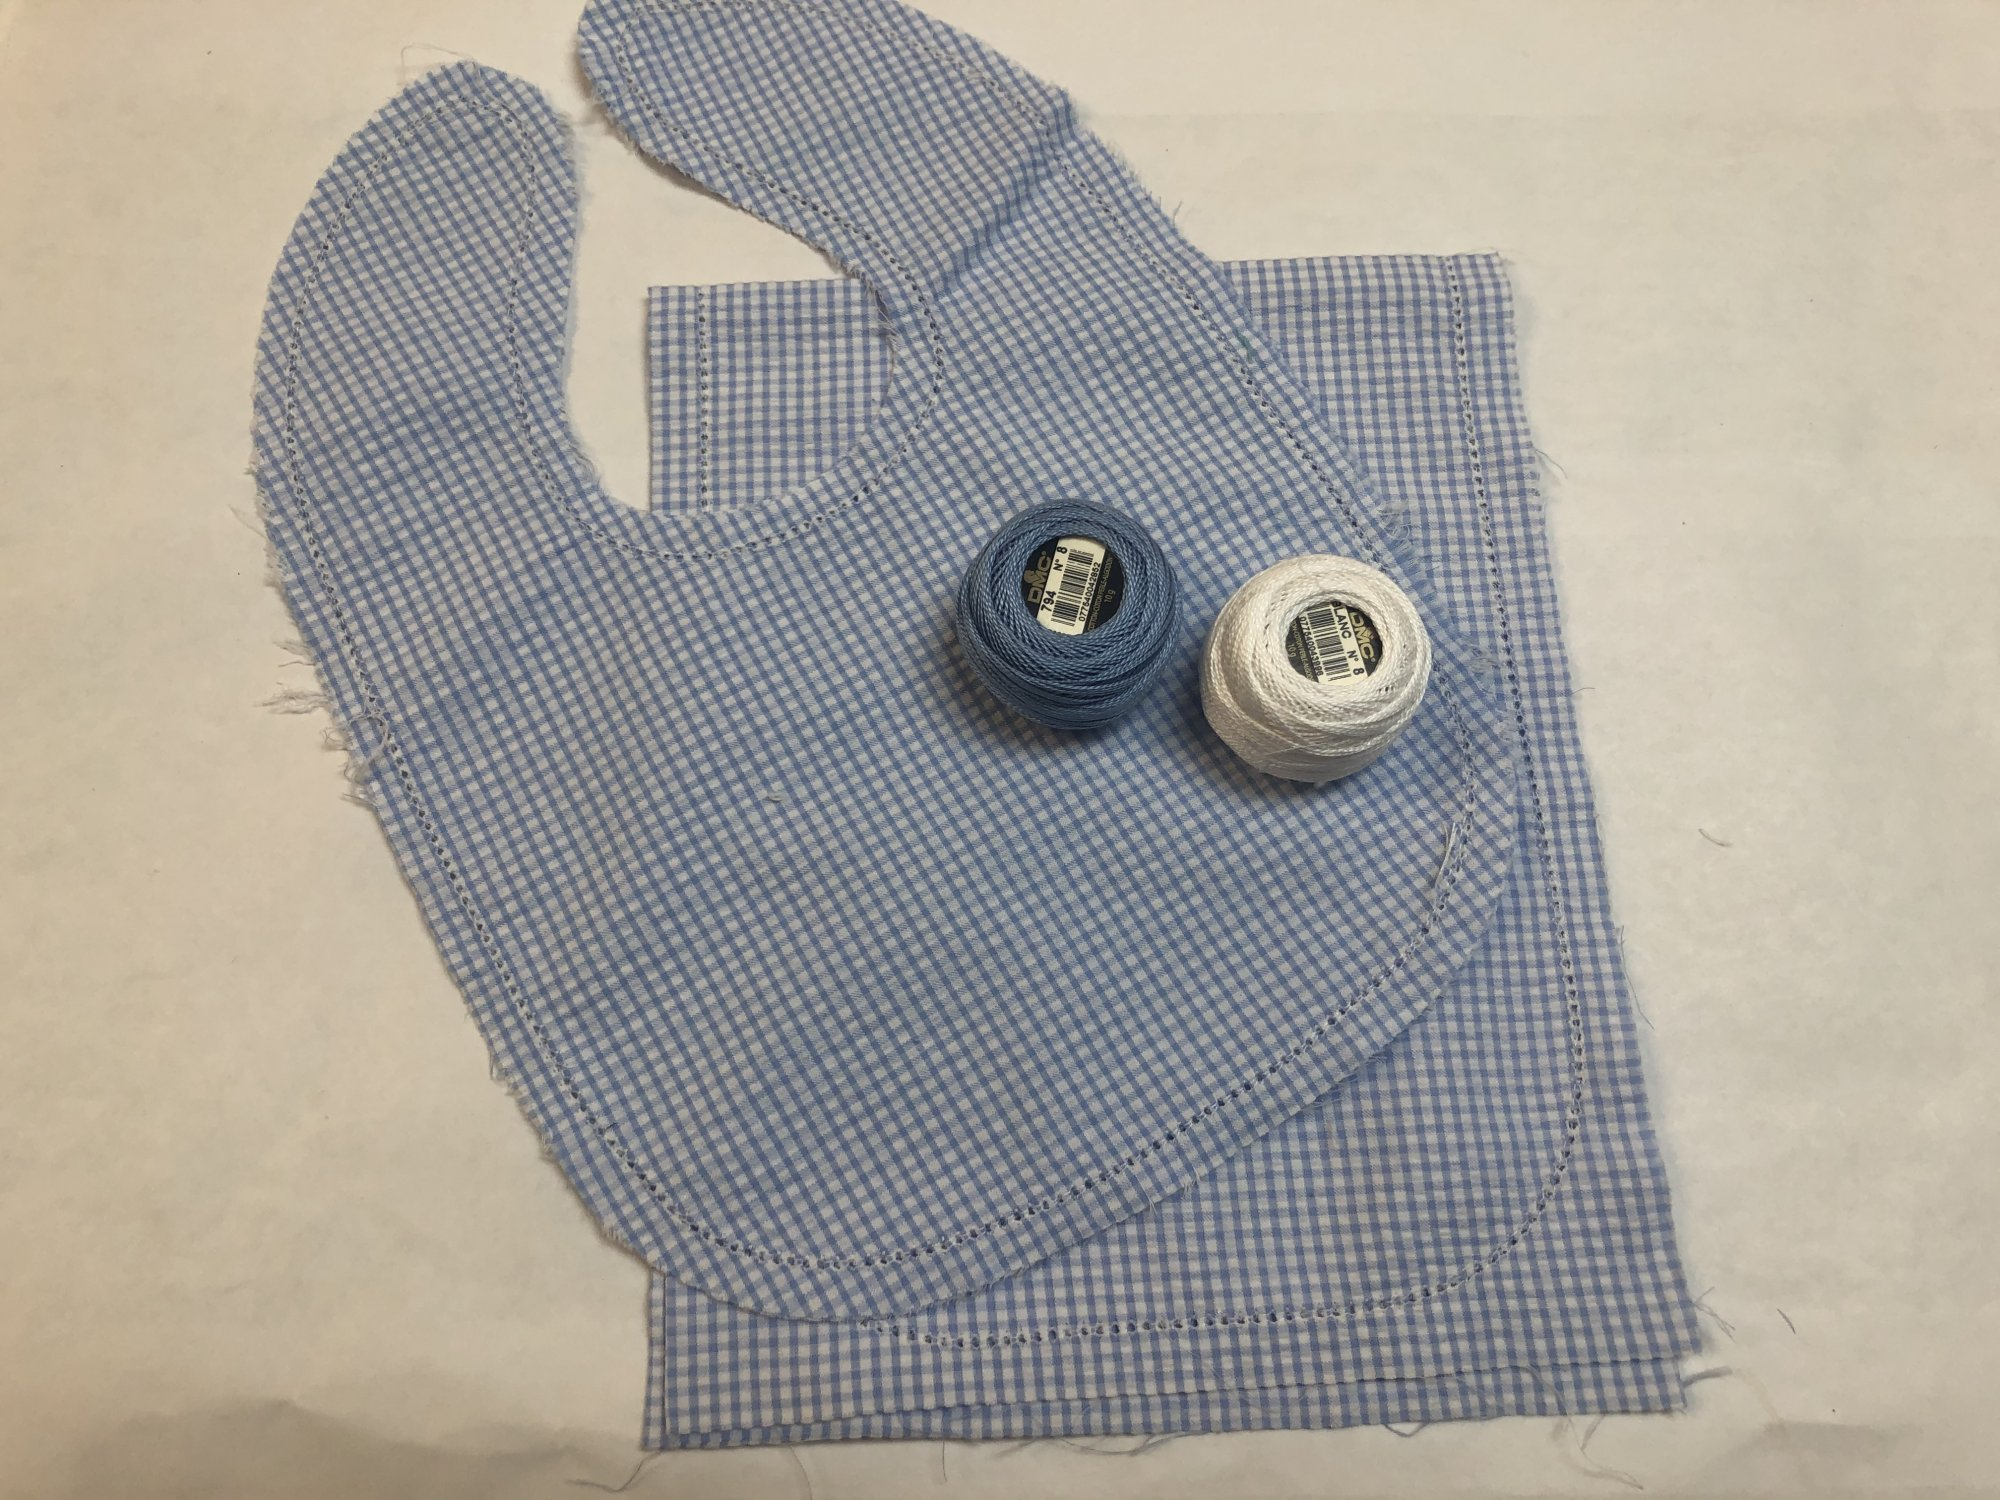 Blue Small Windowpane Hemstitched Seersucker Bib and Burp Cloth Set